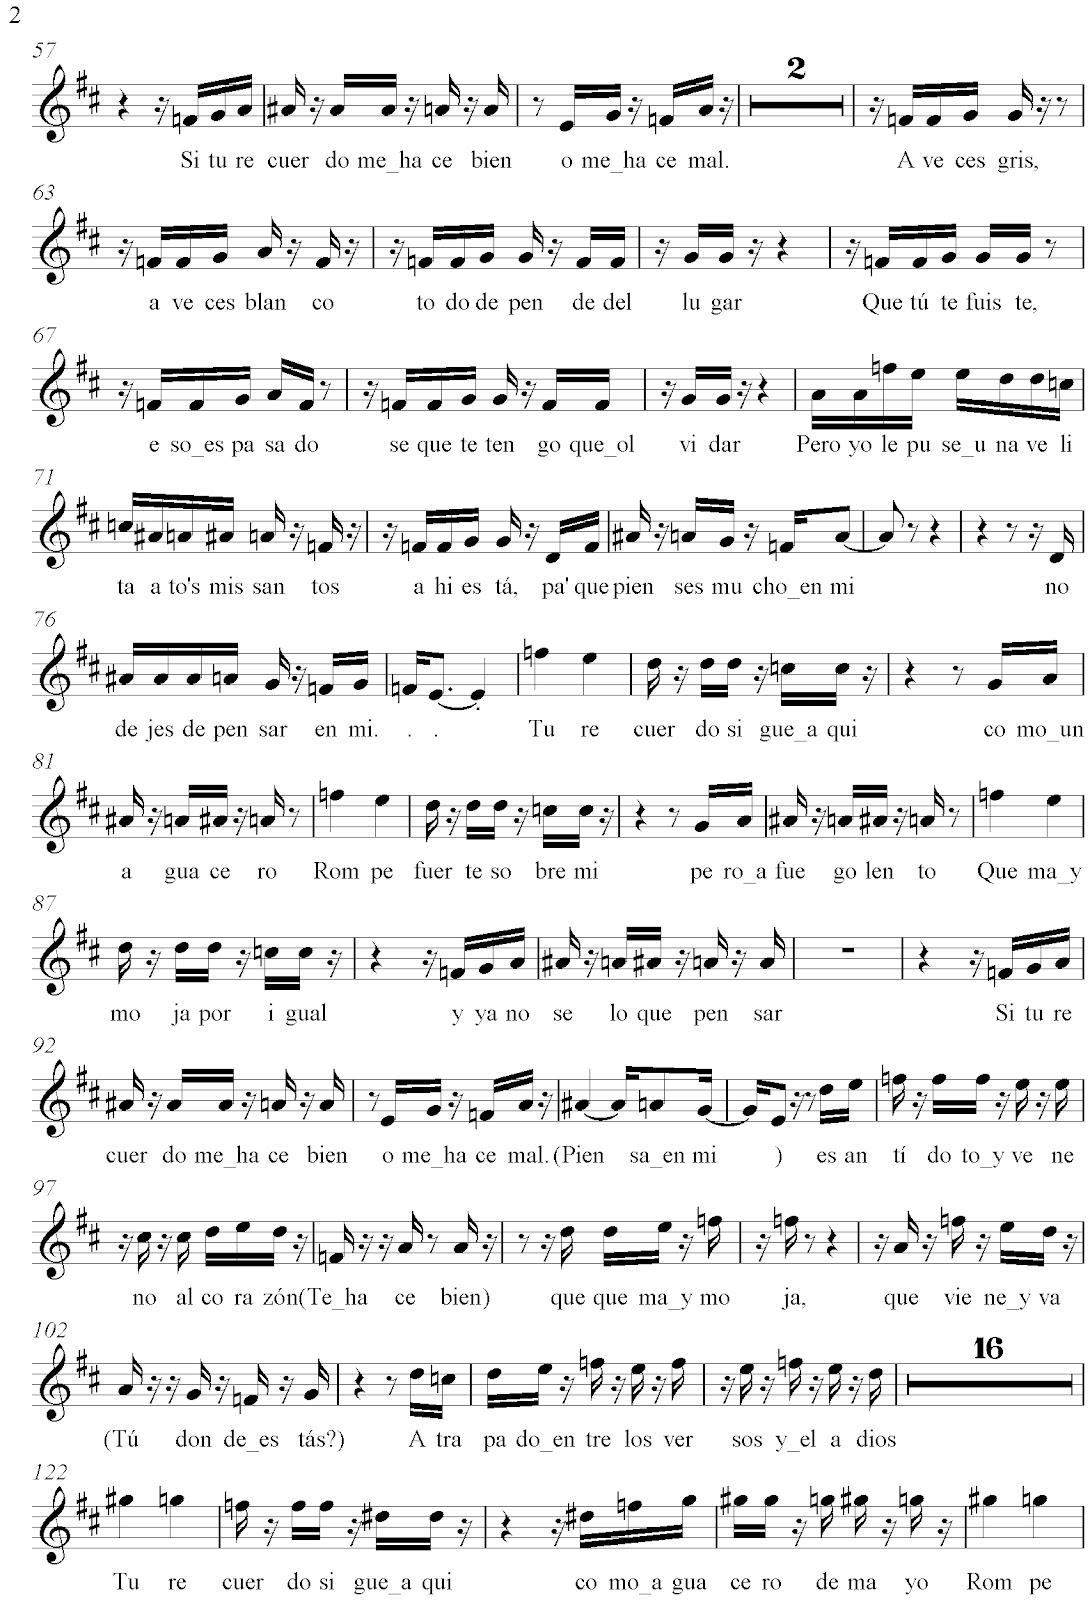 http://2.bp.blogspot.com/-ikfqtA163us/T6VnUNLRYKI/AAAAAAAAA1Q/BkVMv14bKSI/s1600/Ricky+Martin+-+Tu+recuerdo+-+saxo+soprano_0002.bmp